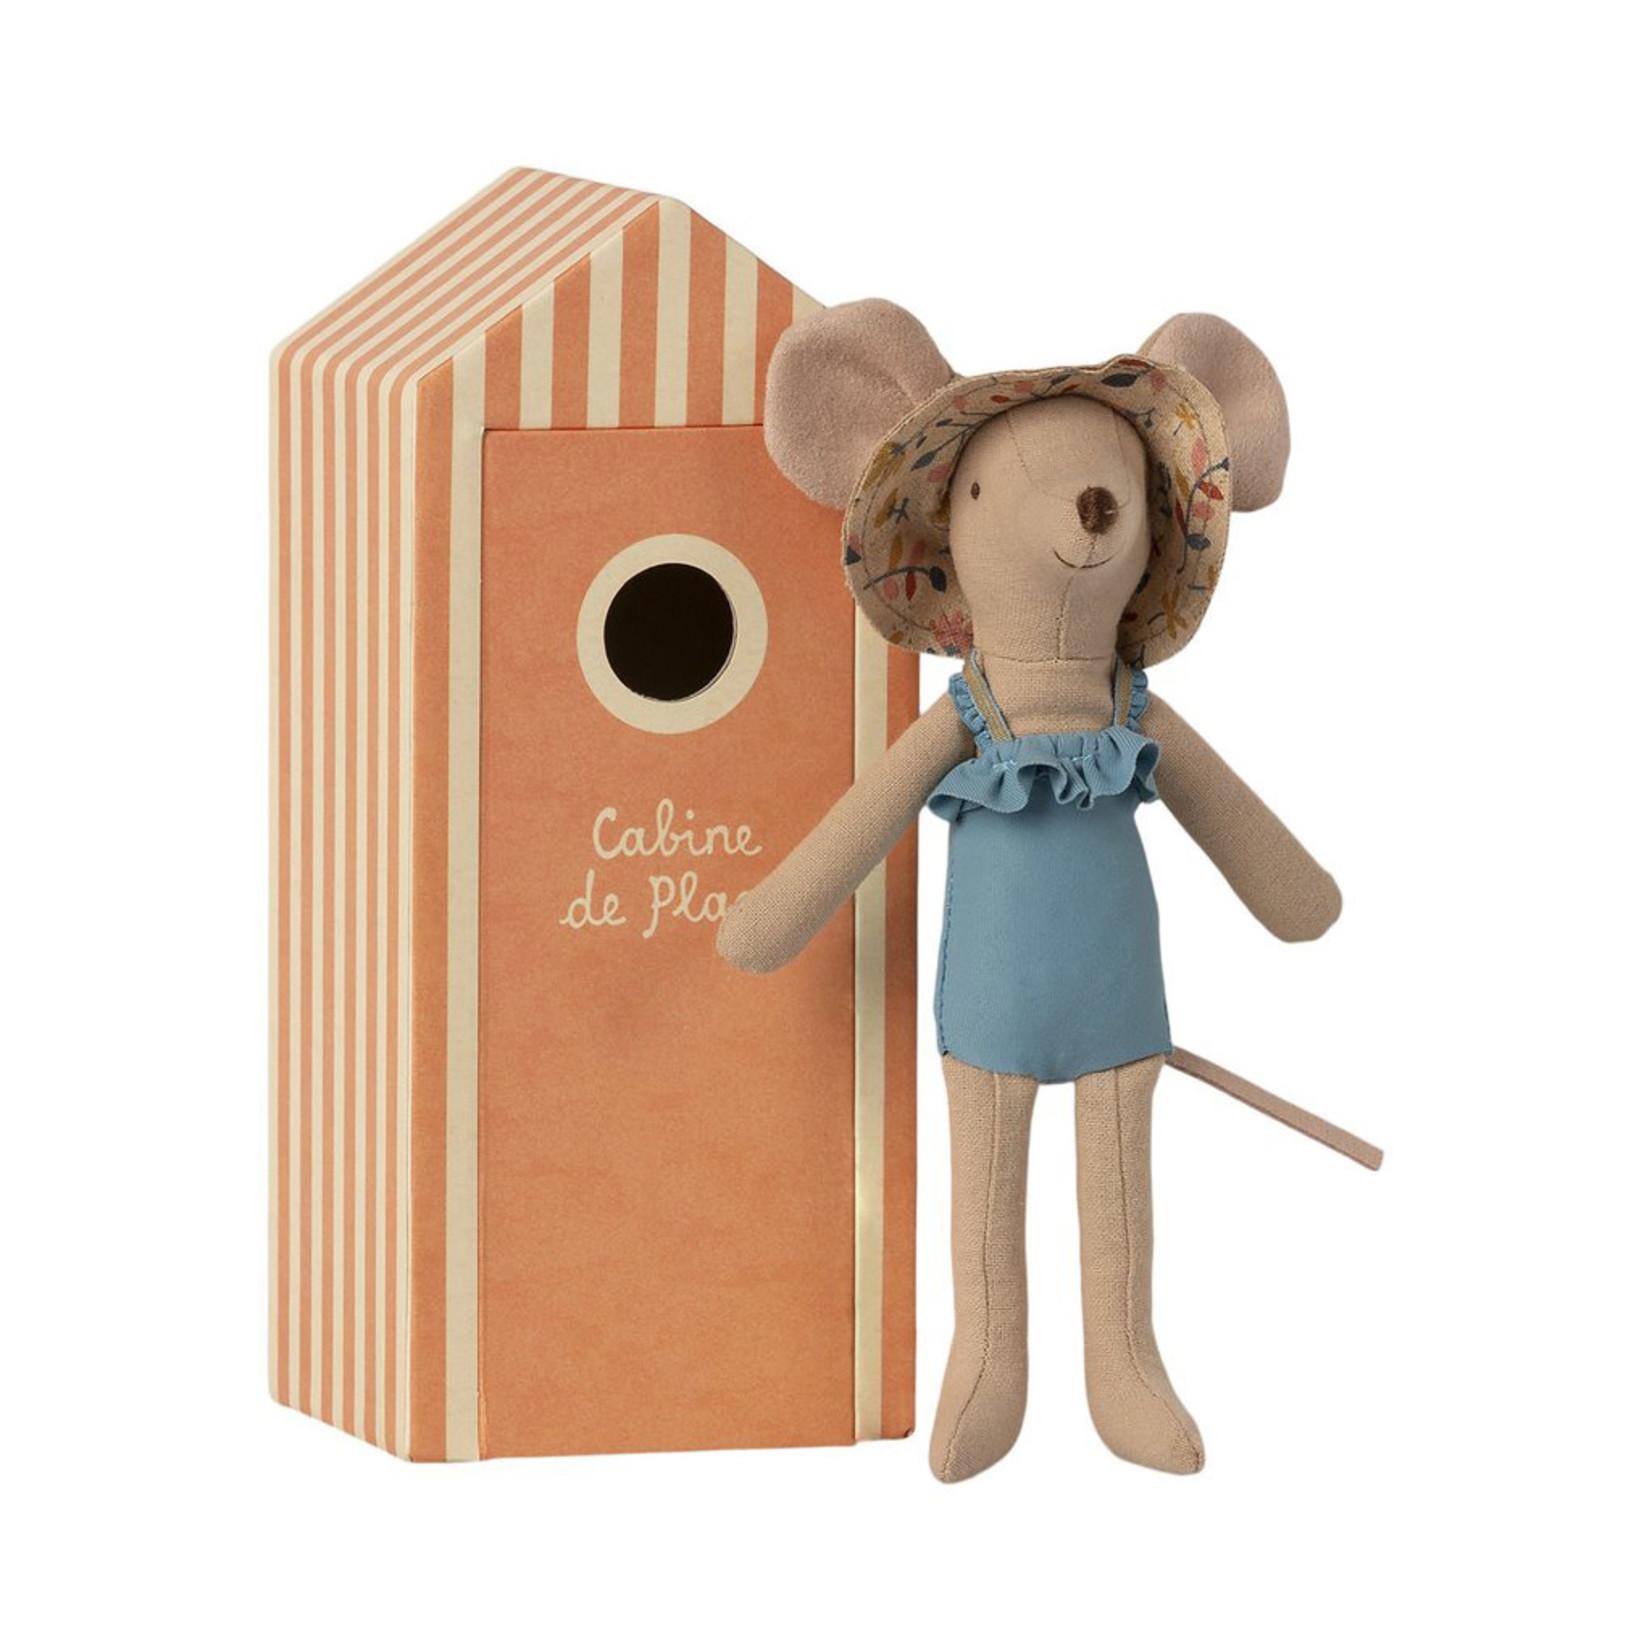 Maileg . NEW IN! Maileg Beach mice, Mum in Cabin de Plage in Peach Beach Hut